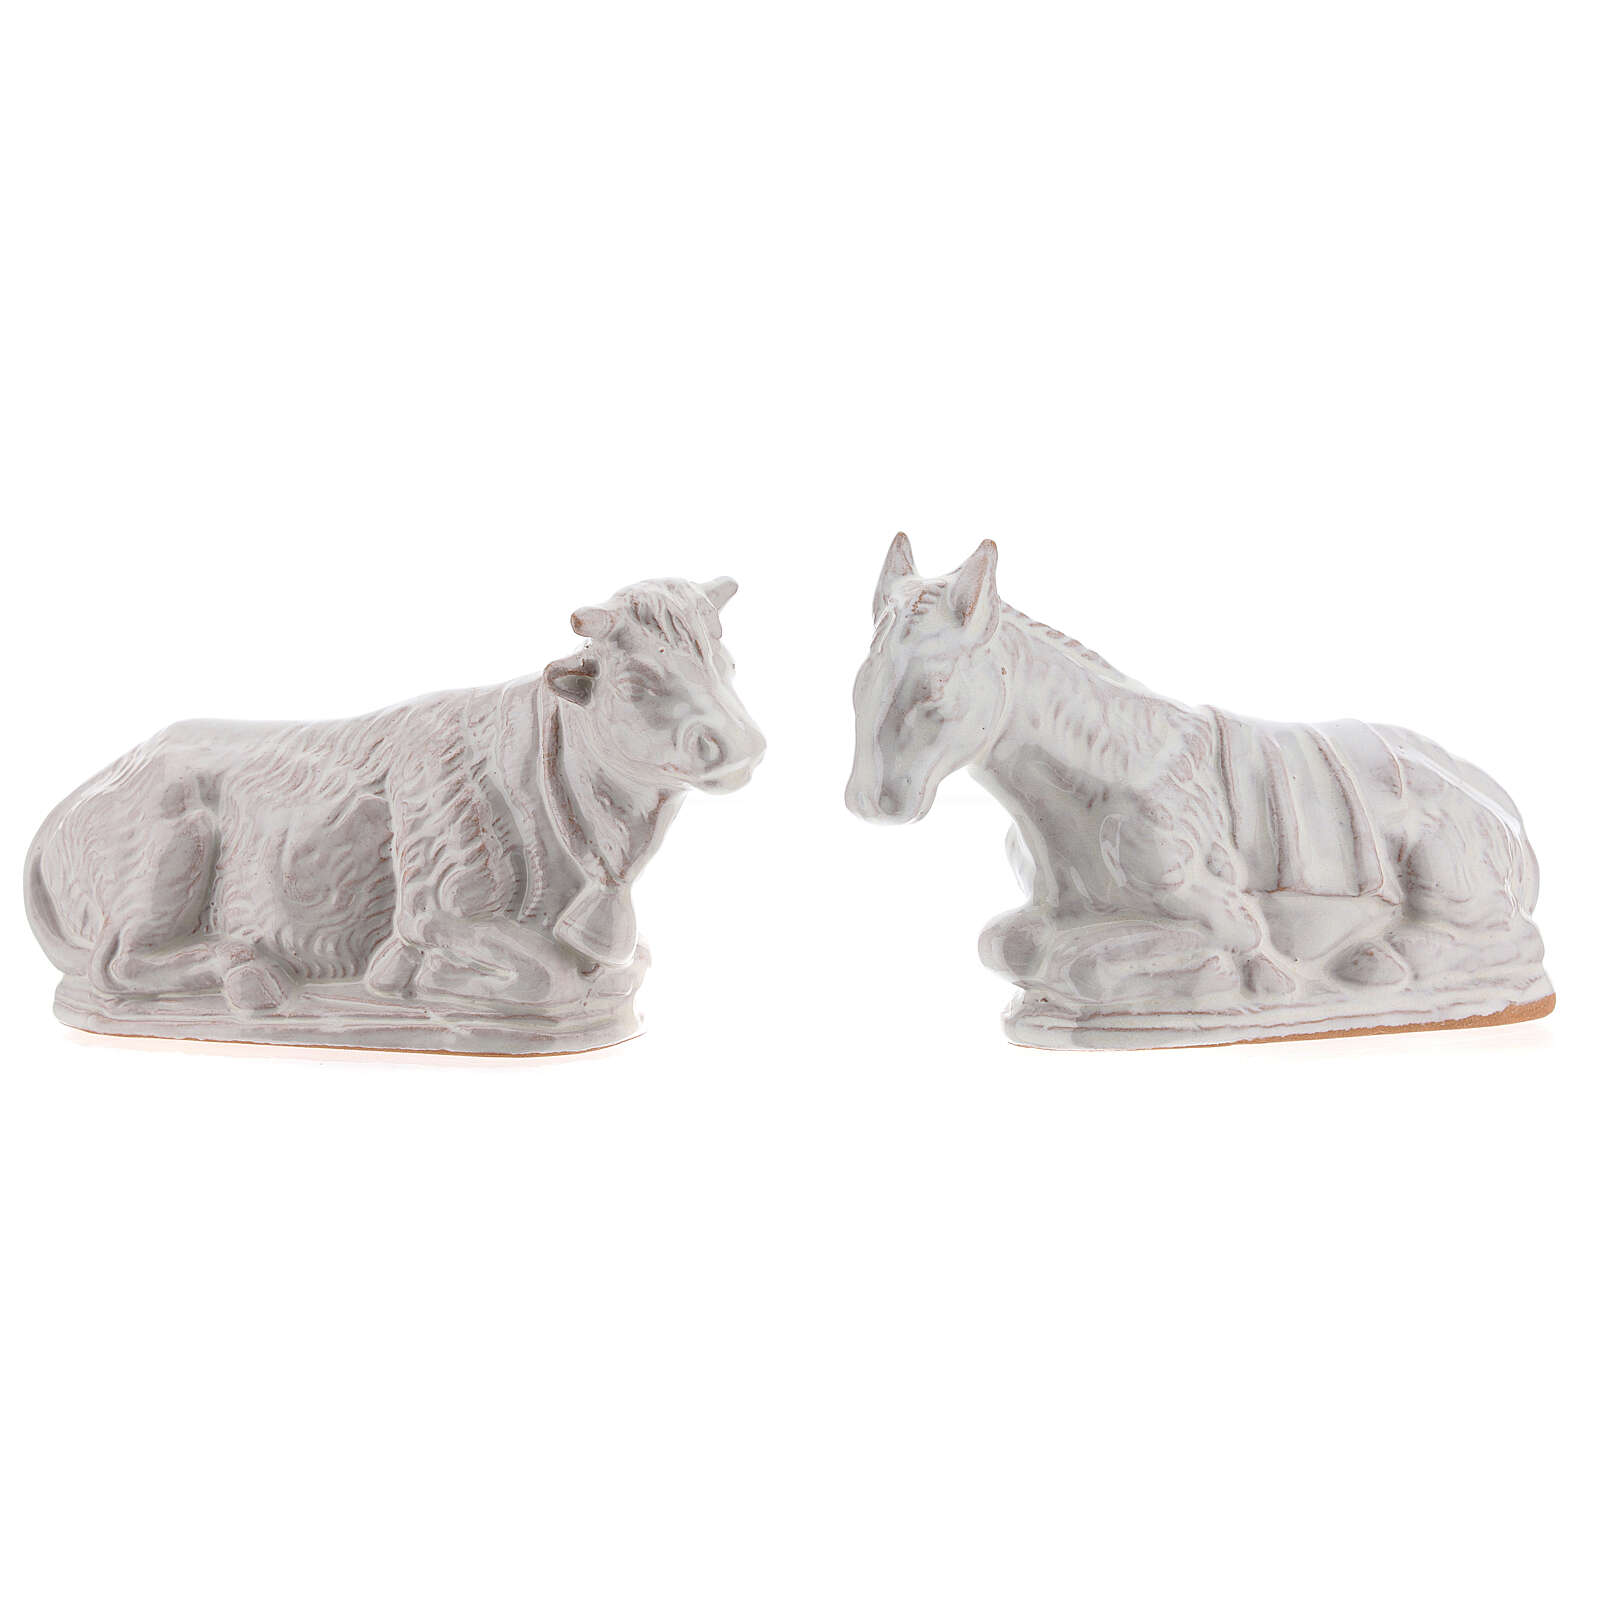 Presepe terracotta smaltata bianca Deruta completo 15 pezzi 15 cm 4